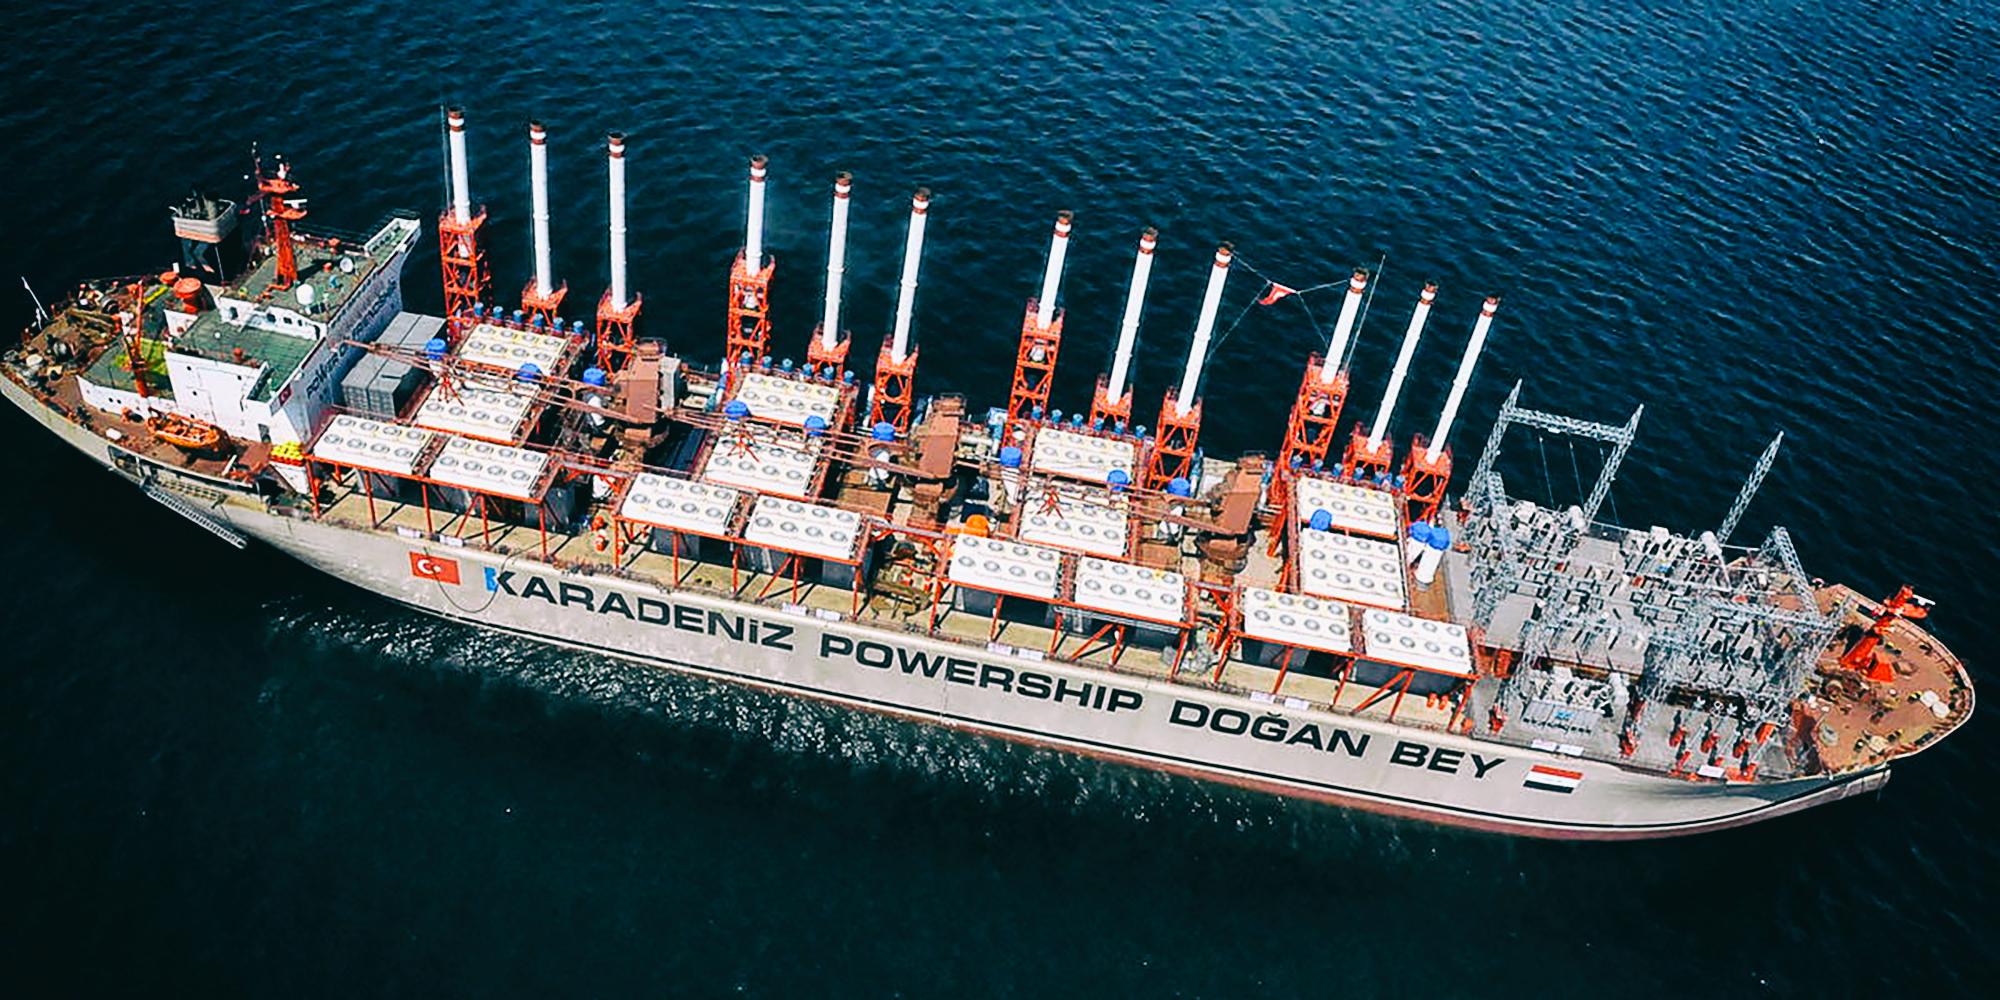 Turkish powership admirals get Nersa nod – but minist... - Daily Maverick